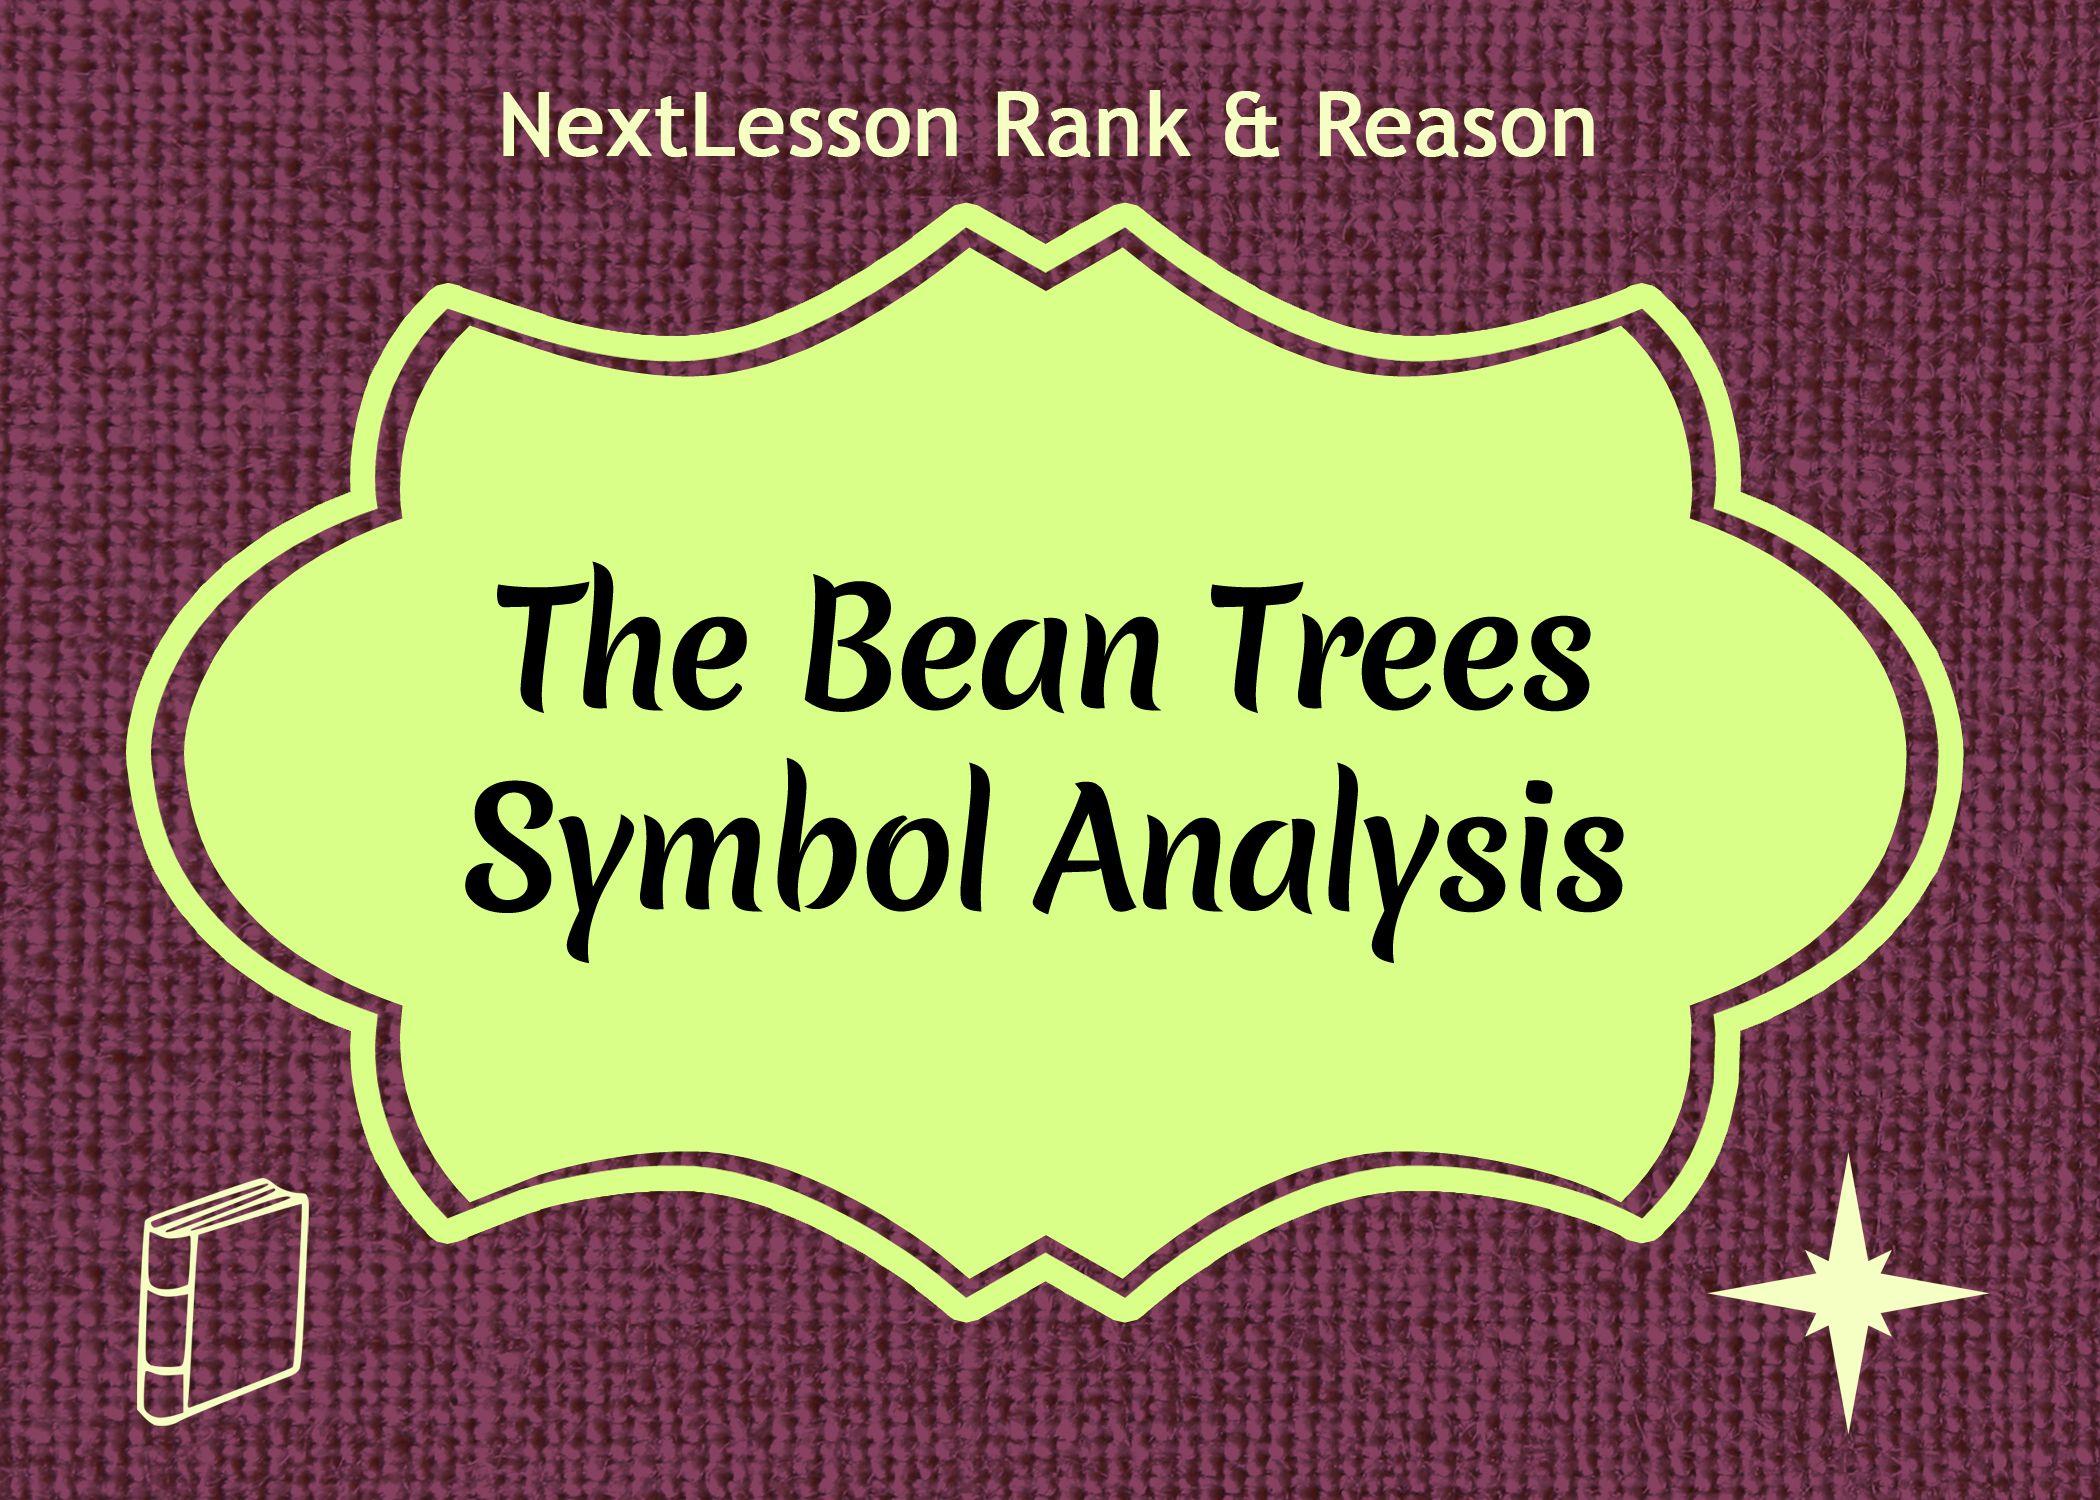 The Bean Trees Symbolysis